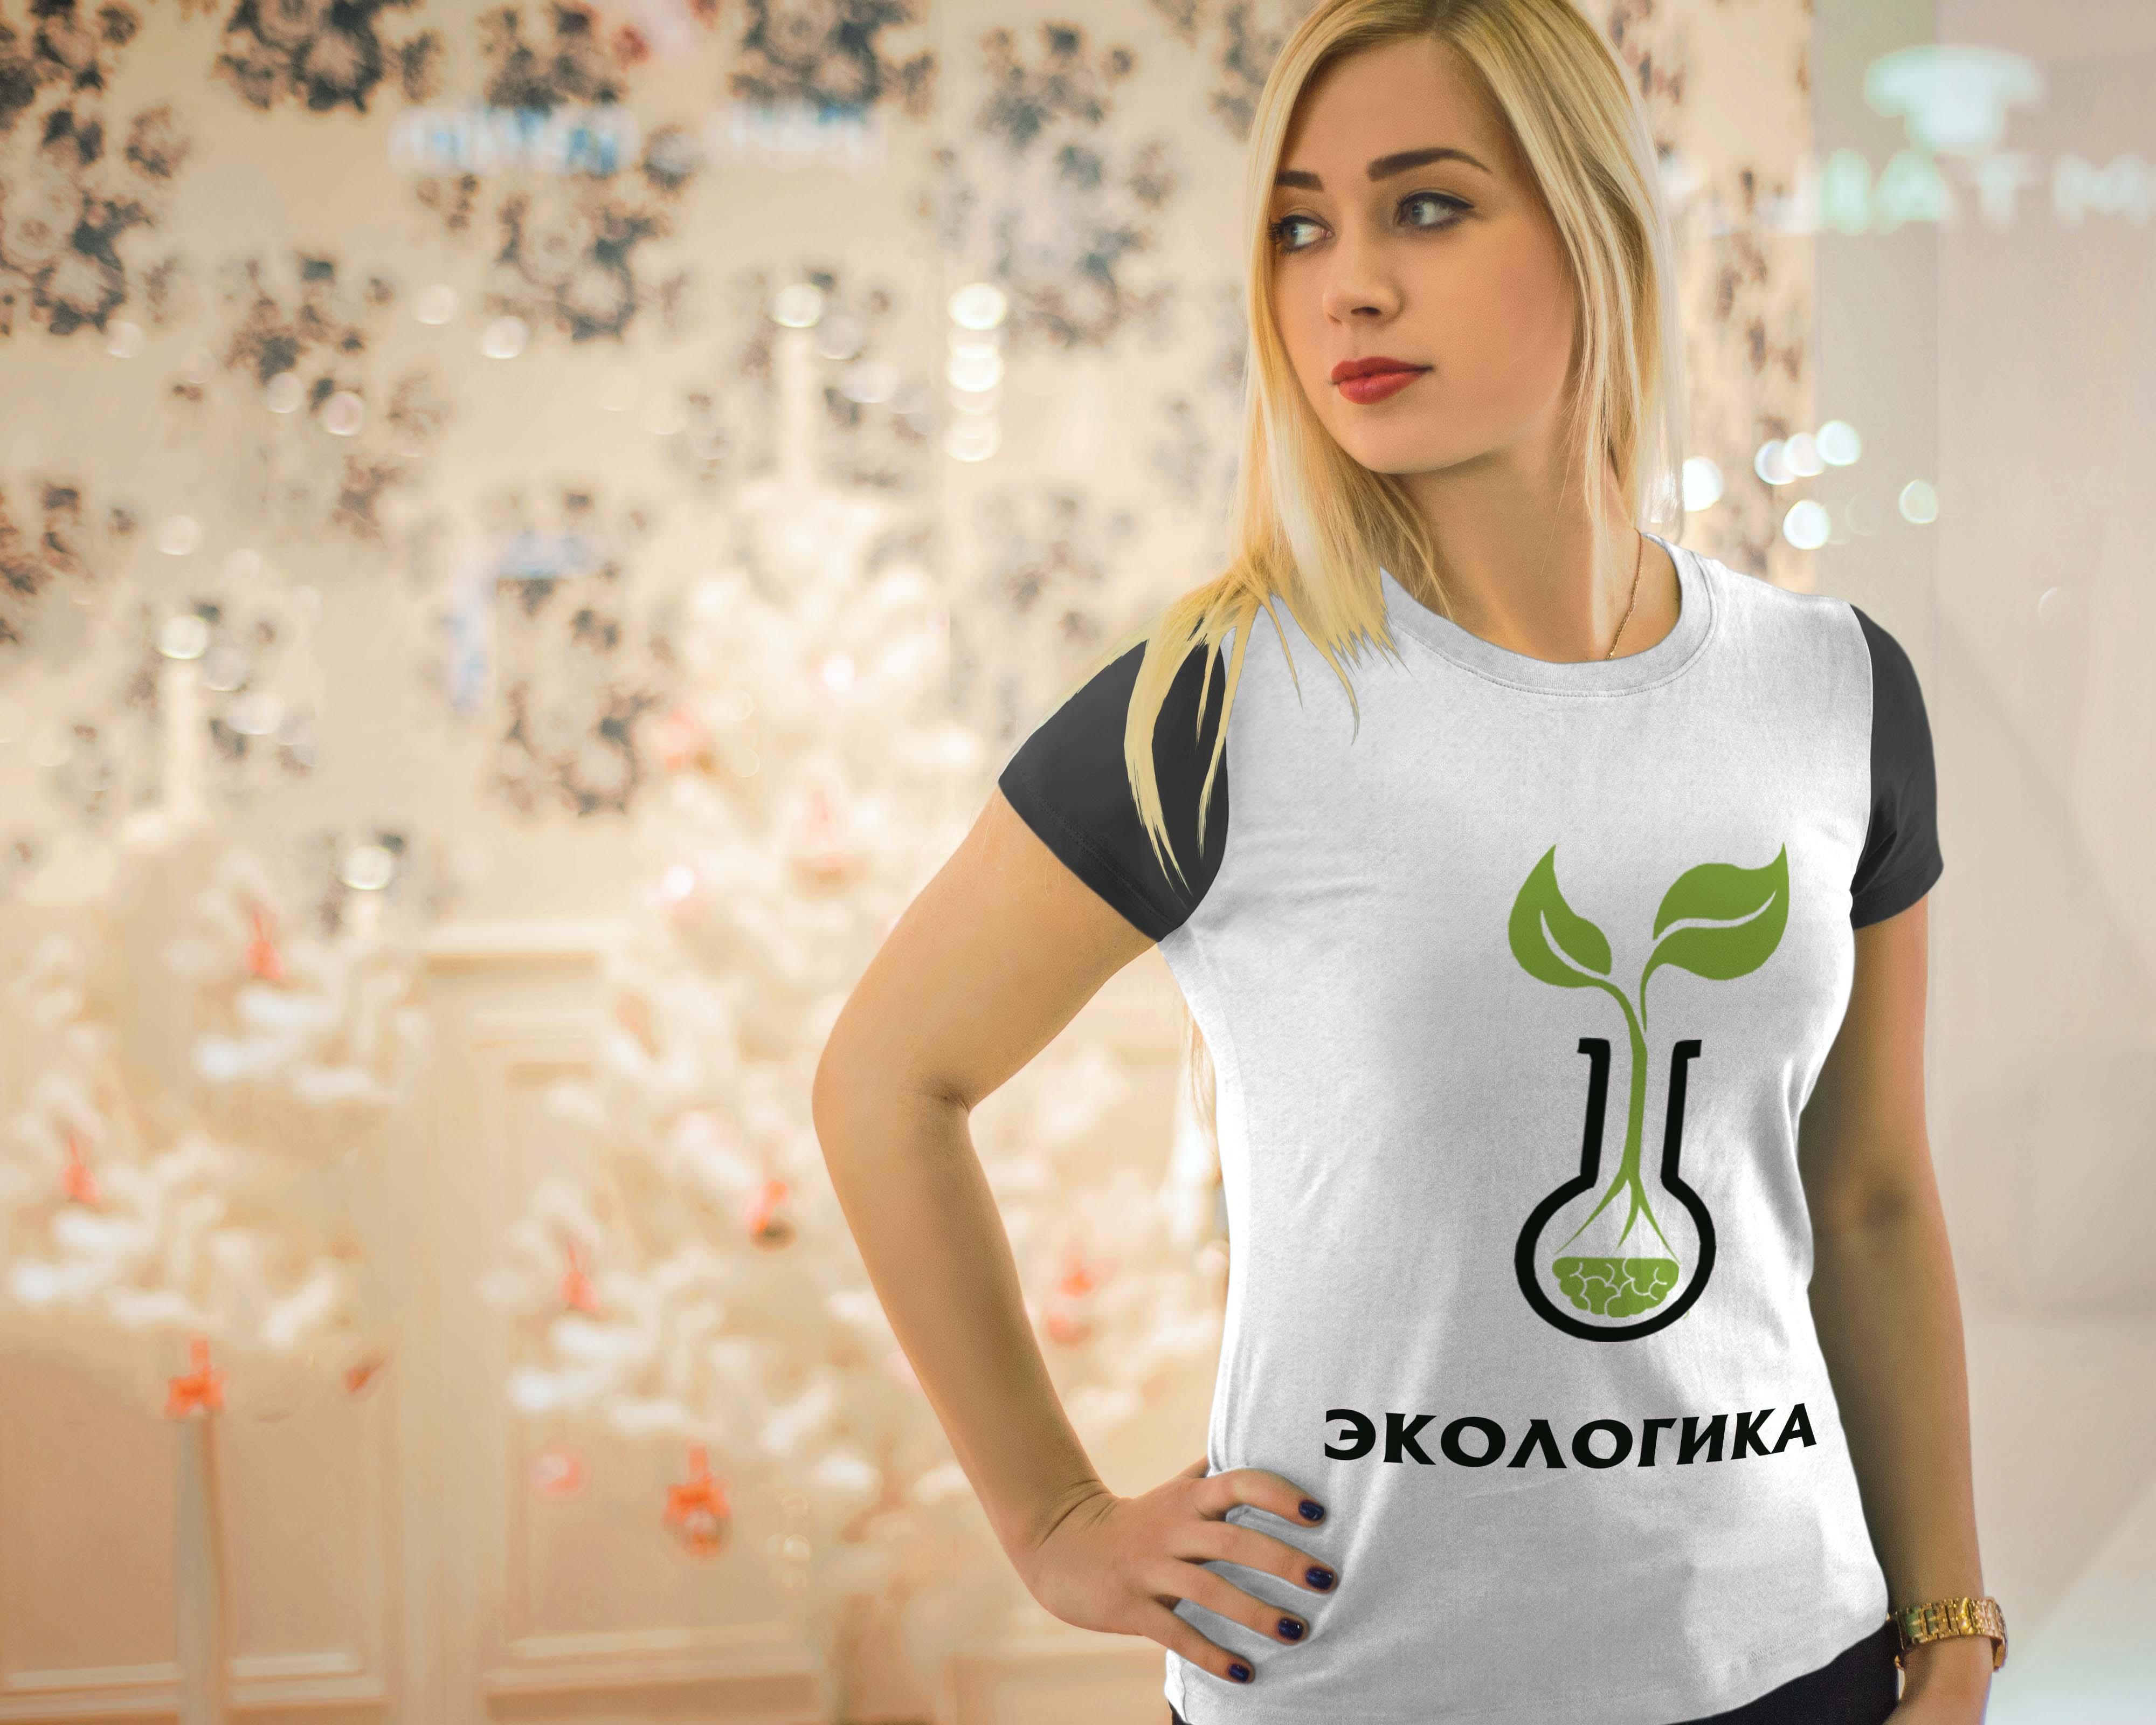 Логотип ЭКОЛОГИКА фото f_051593d0d75348d2.jpg